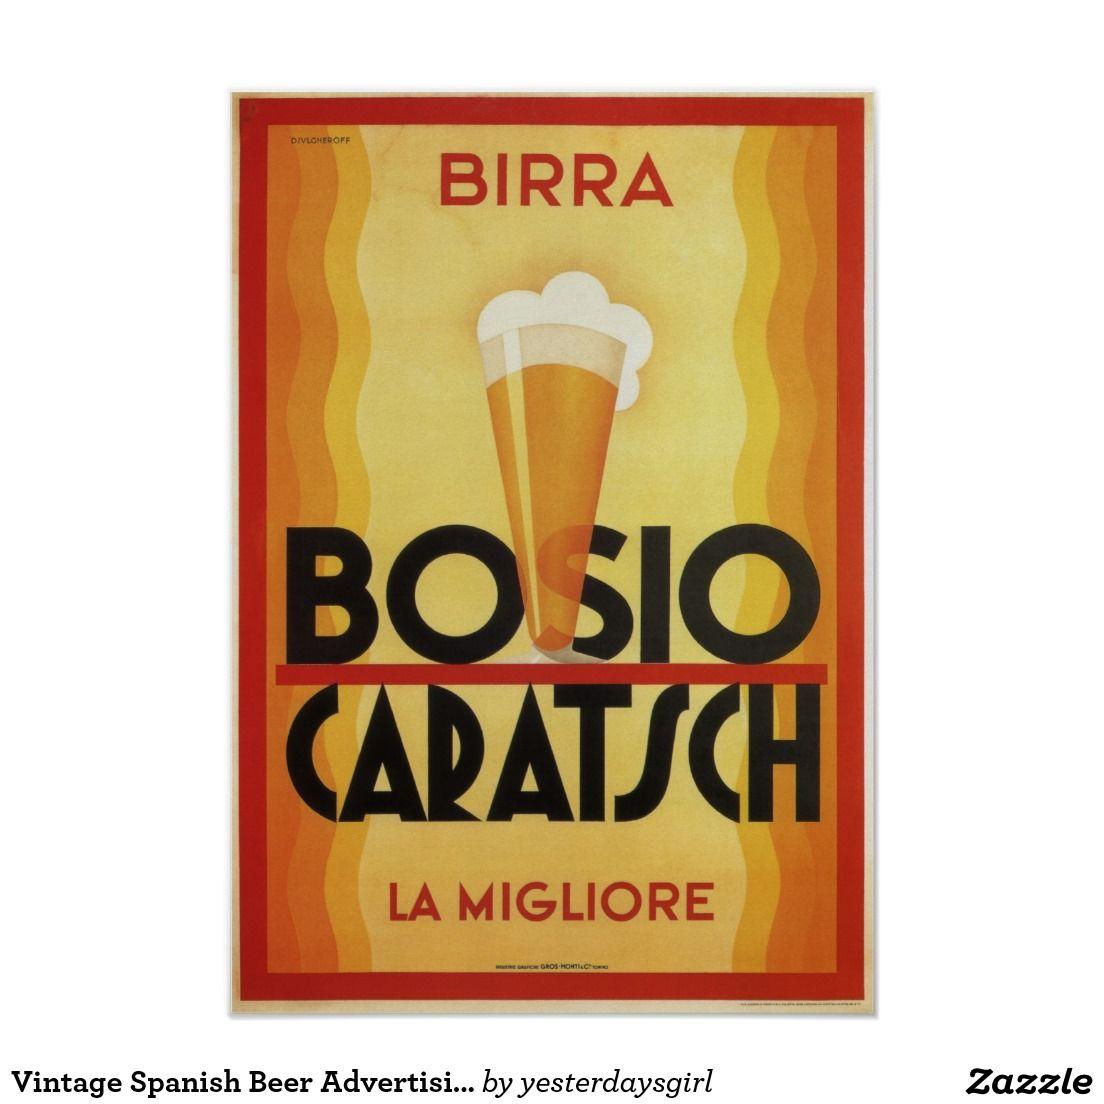 Vintage Spanish Beer Advertising Poster, Birra Poster ...